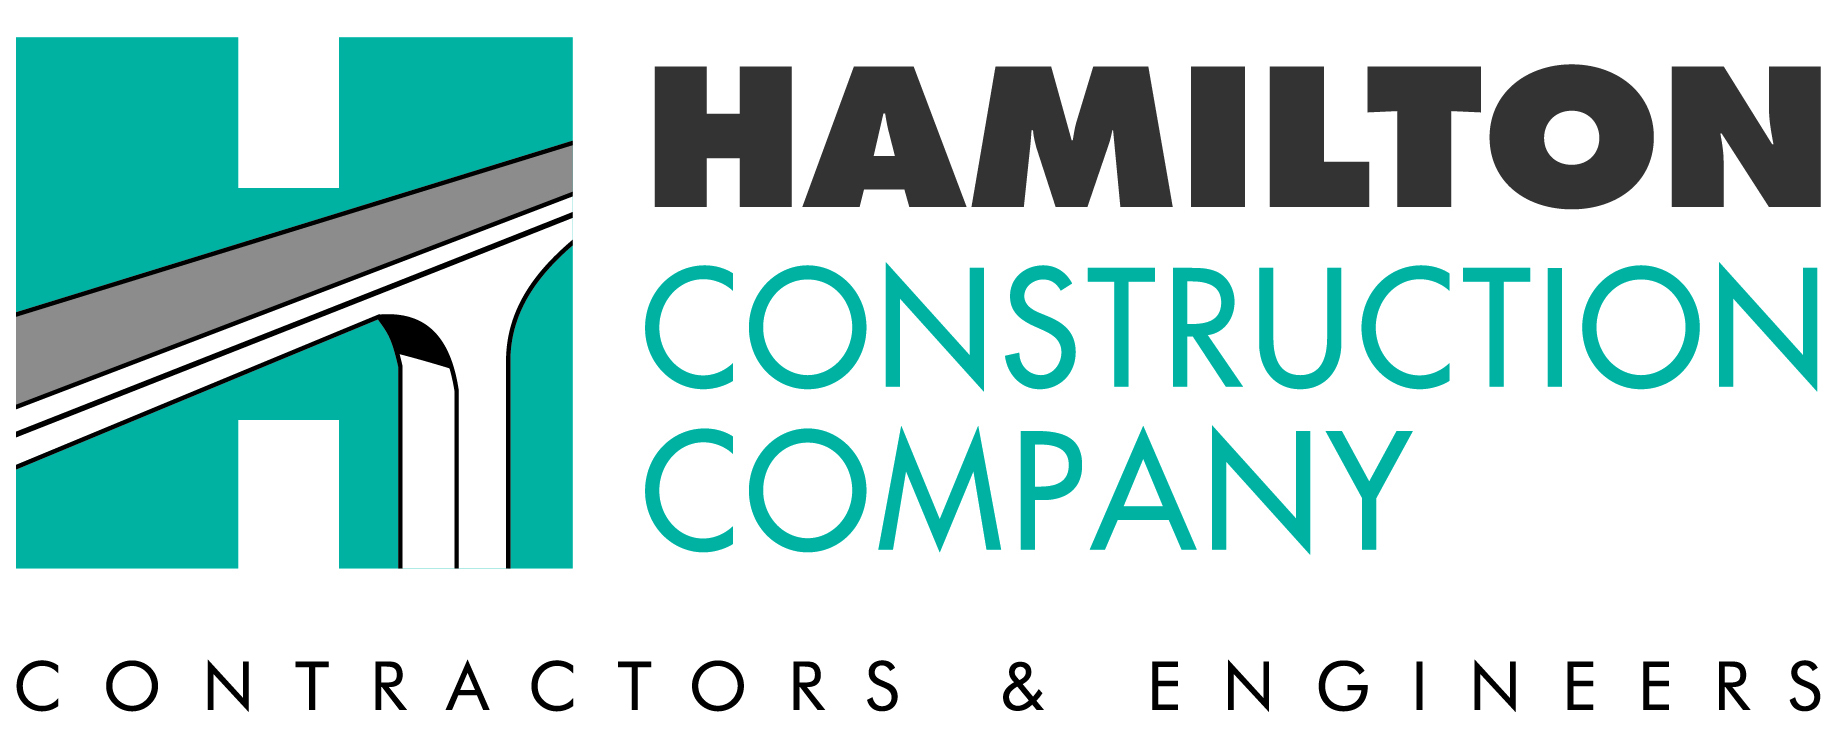 Hamilton__logo_higher_rez.jpg